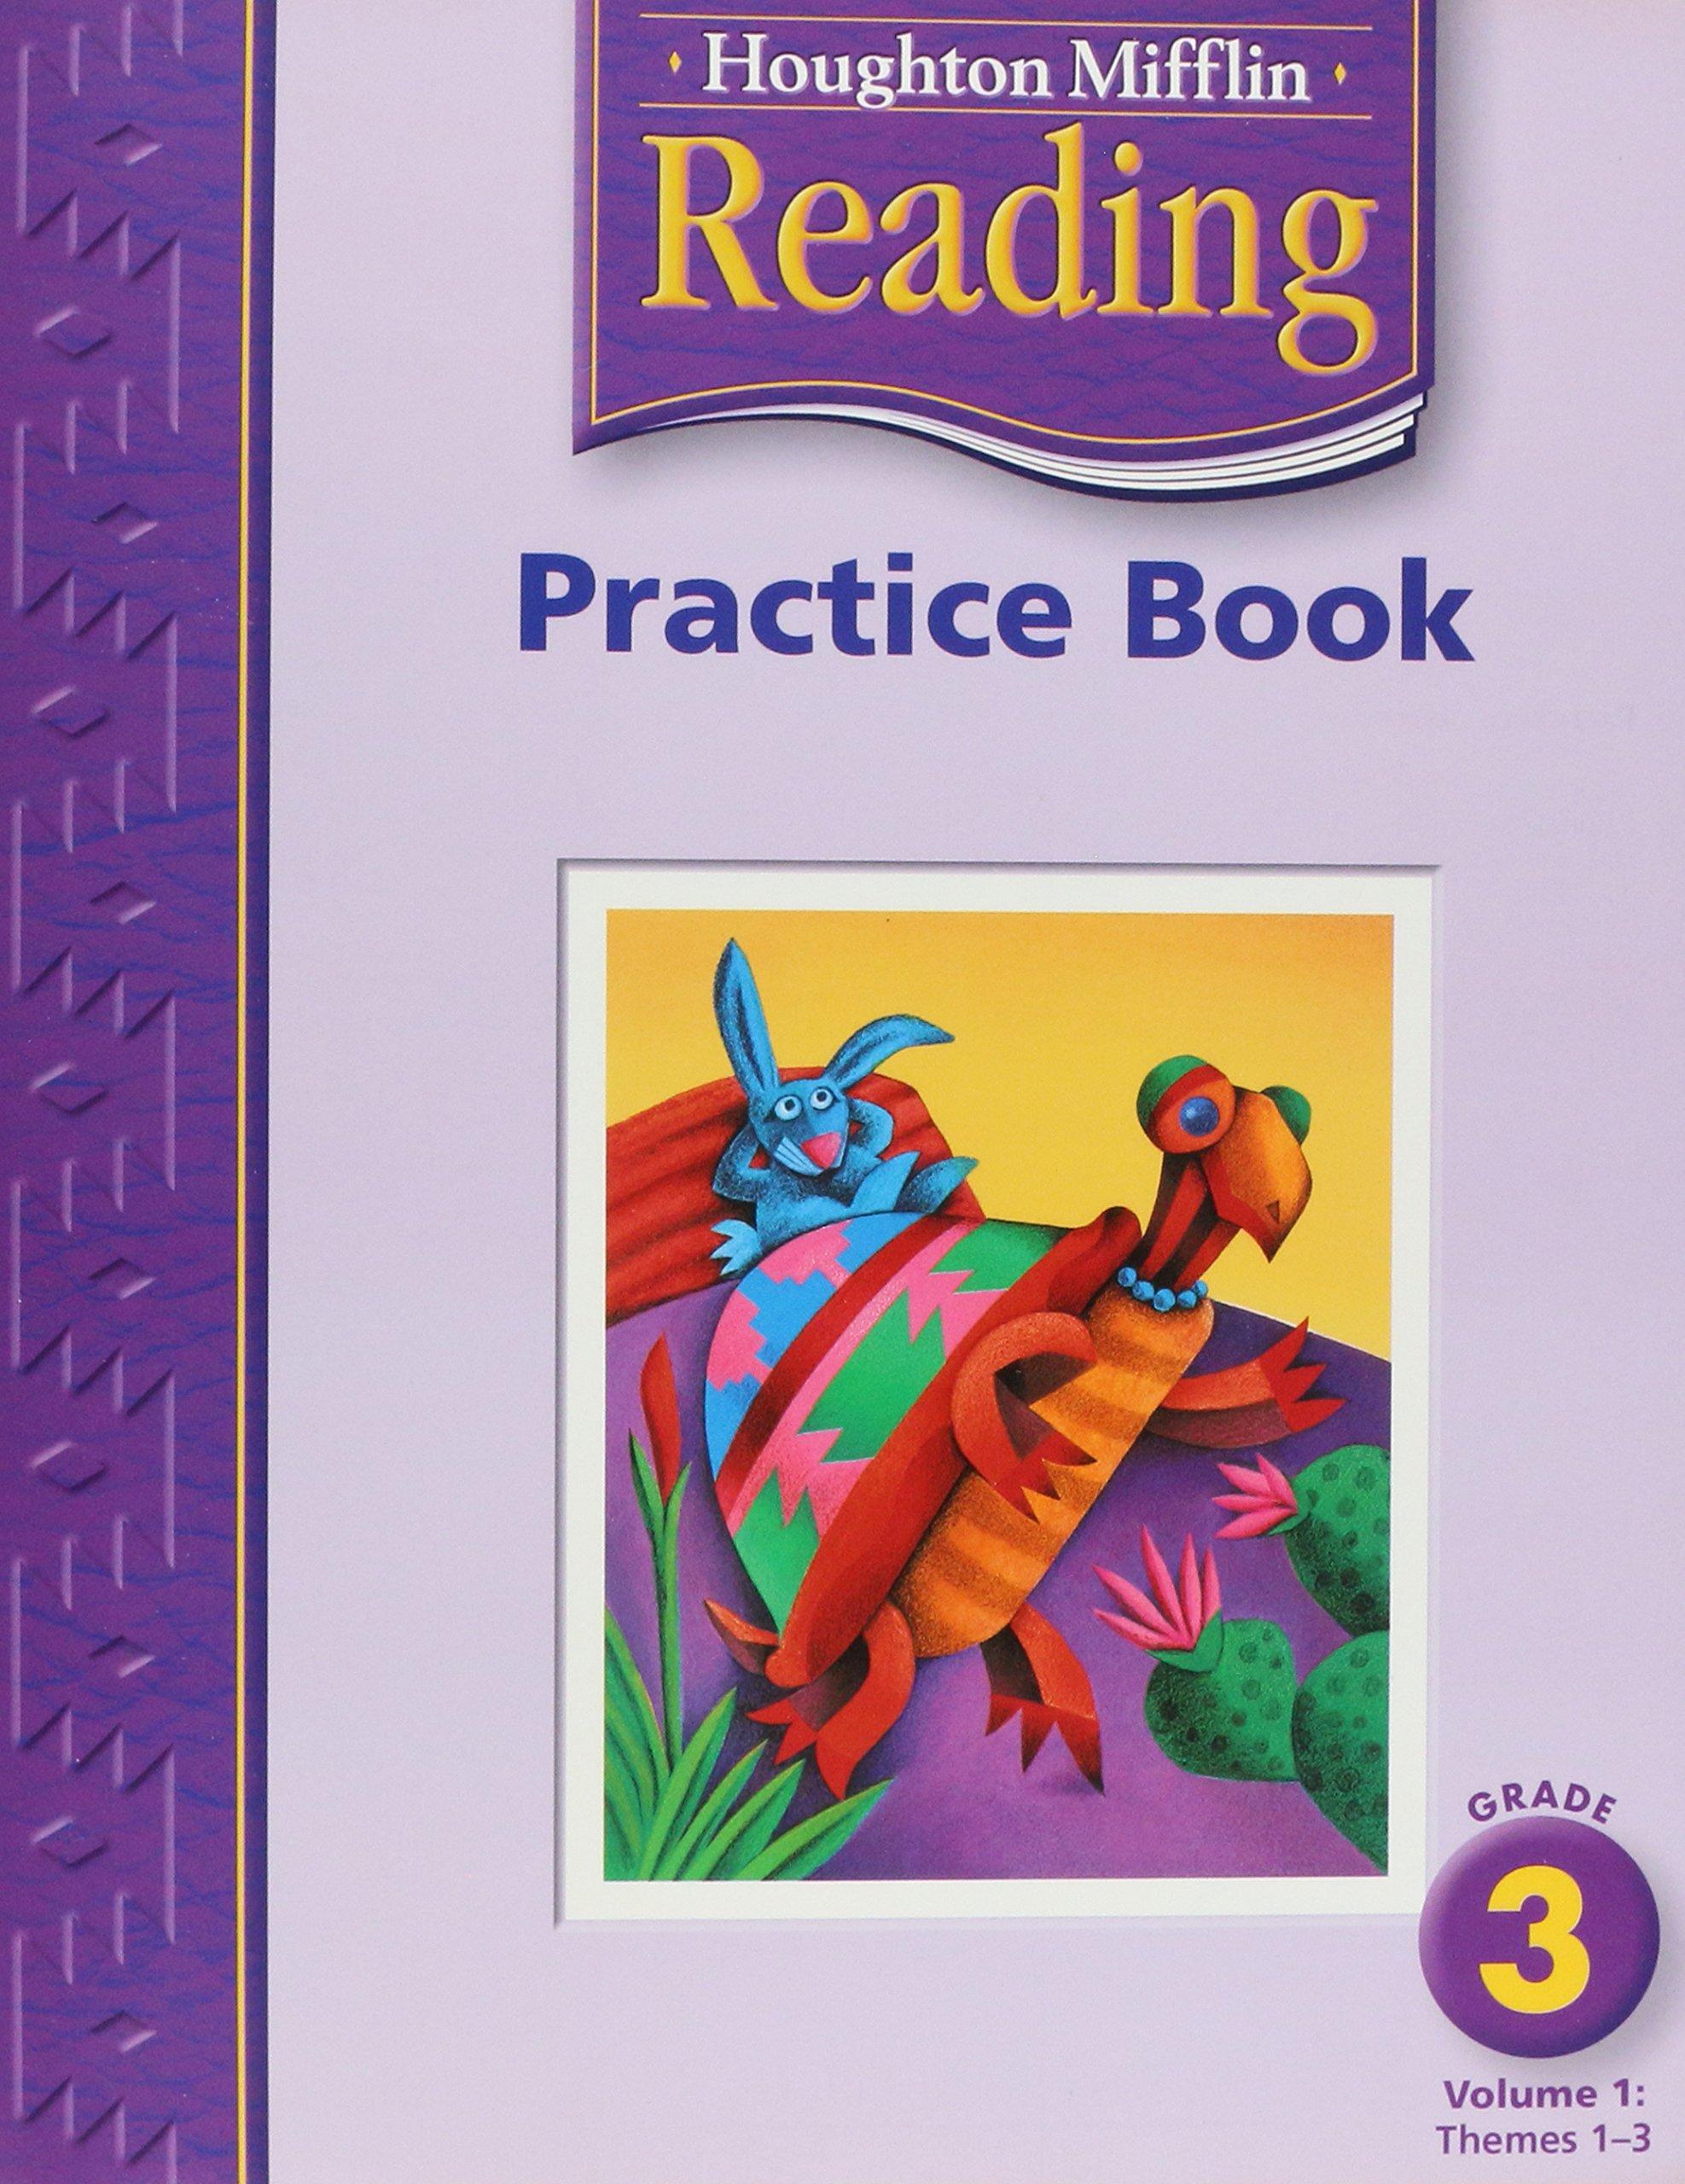 Amazon.com: Houghton Mifflin Reading Practice Book, Grade 3 Volumes 1 & 2  (9780618424559): HOUGHTON MIFFLIN: Books